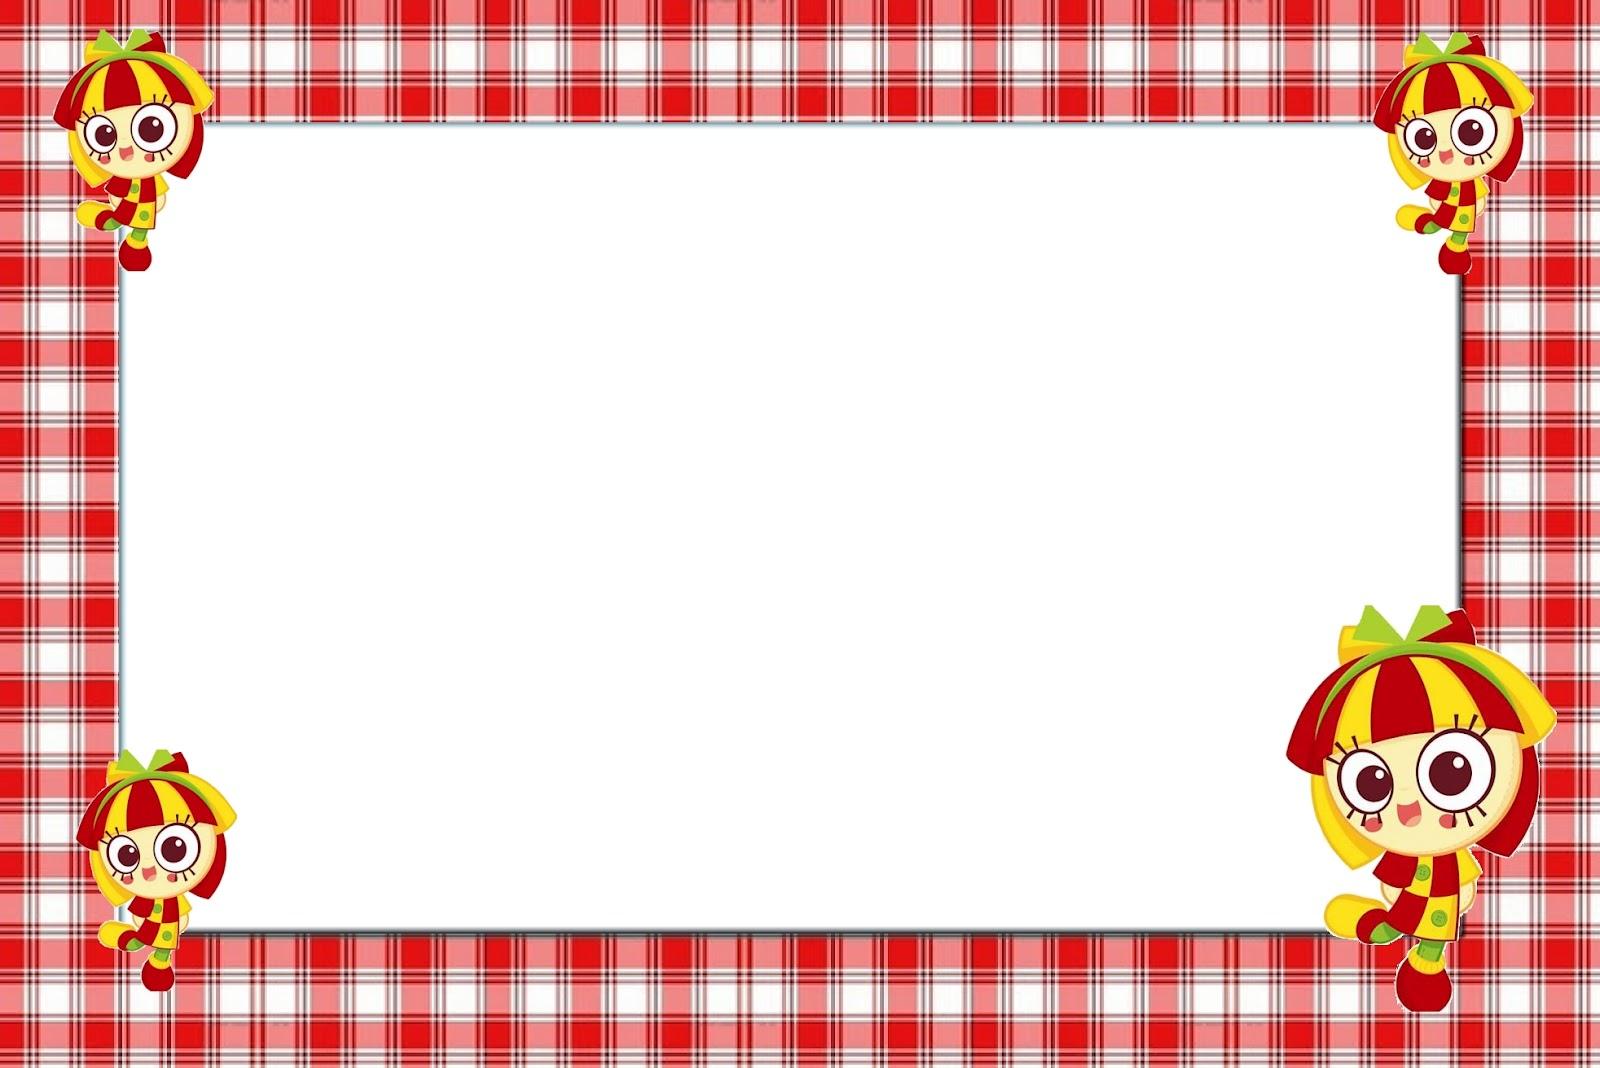 Coisas do sitio sitio do picapau amarelo for Picas redondas